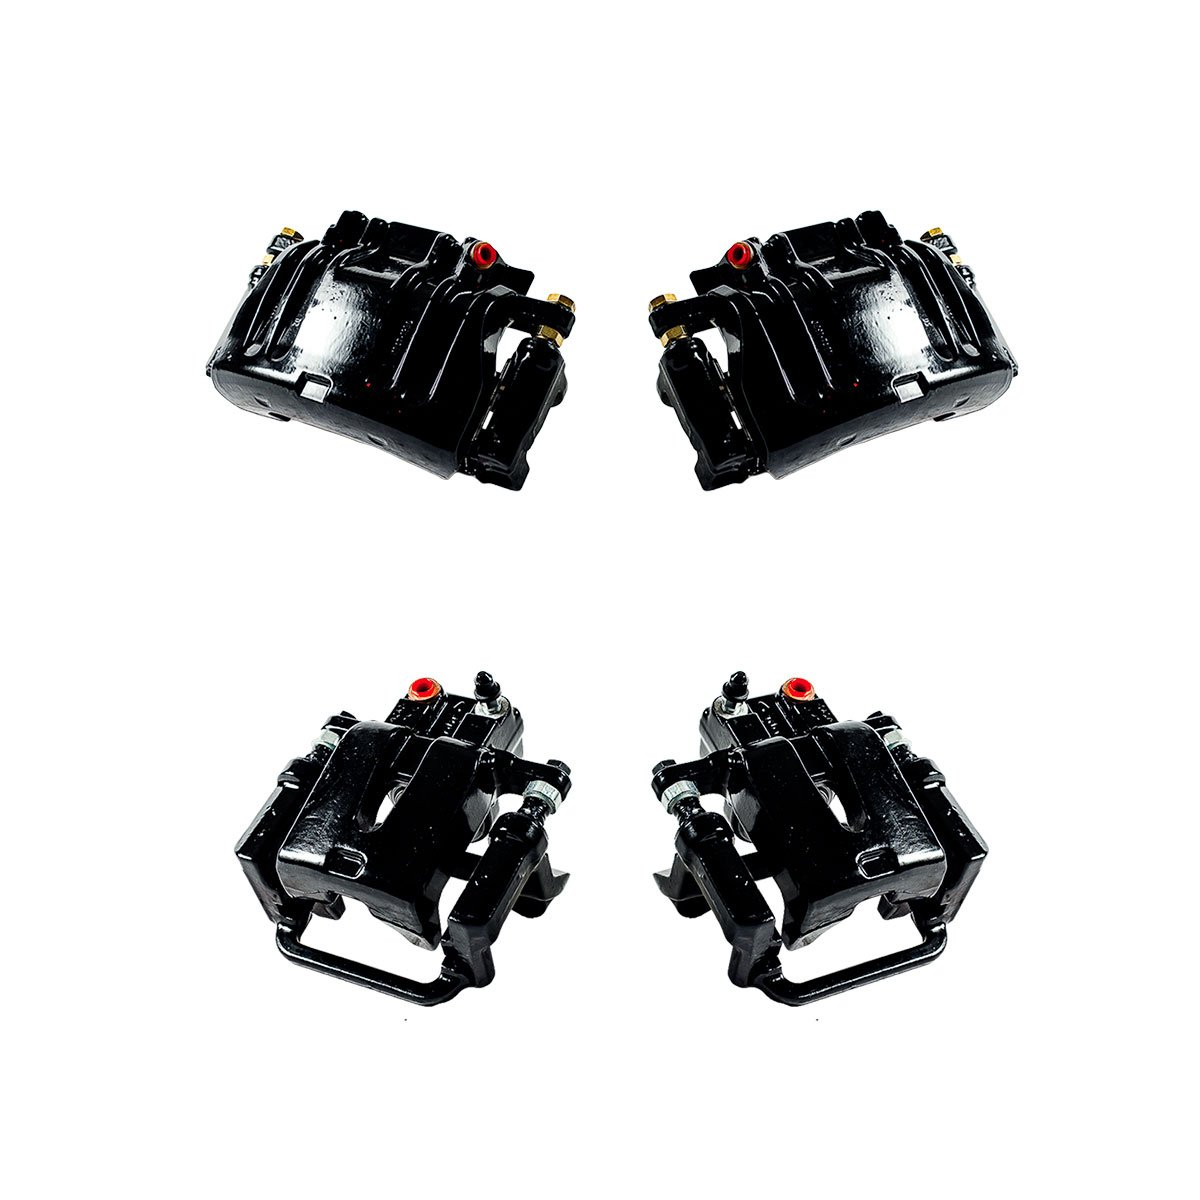 CCK01239 FRONT + REAR [ 4 ] Performance Grade Semi-Loaded Powder Coated Black Caliper Assembly Set Kit